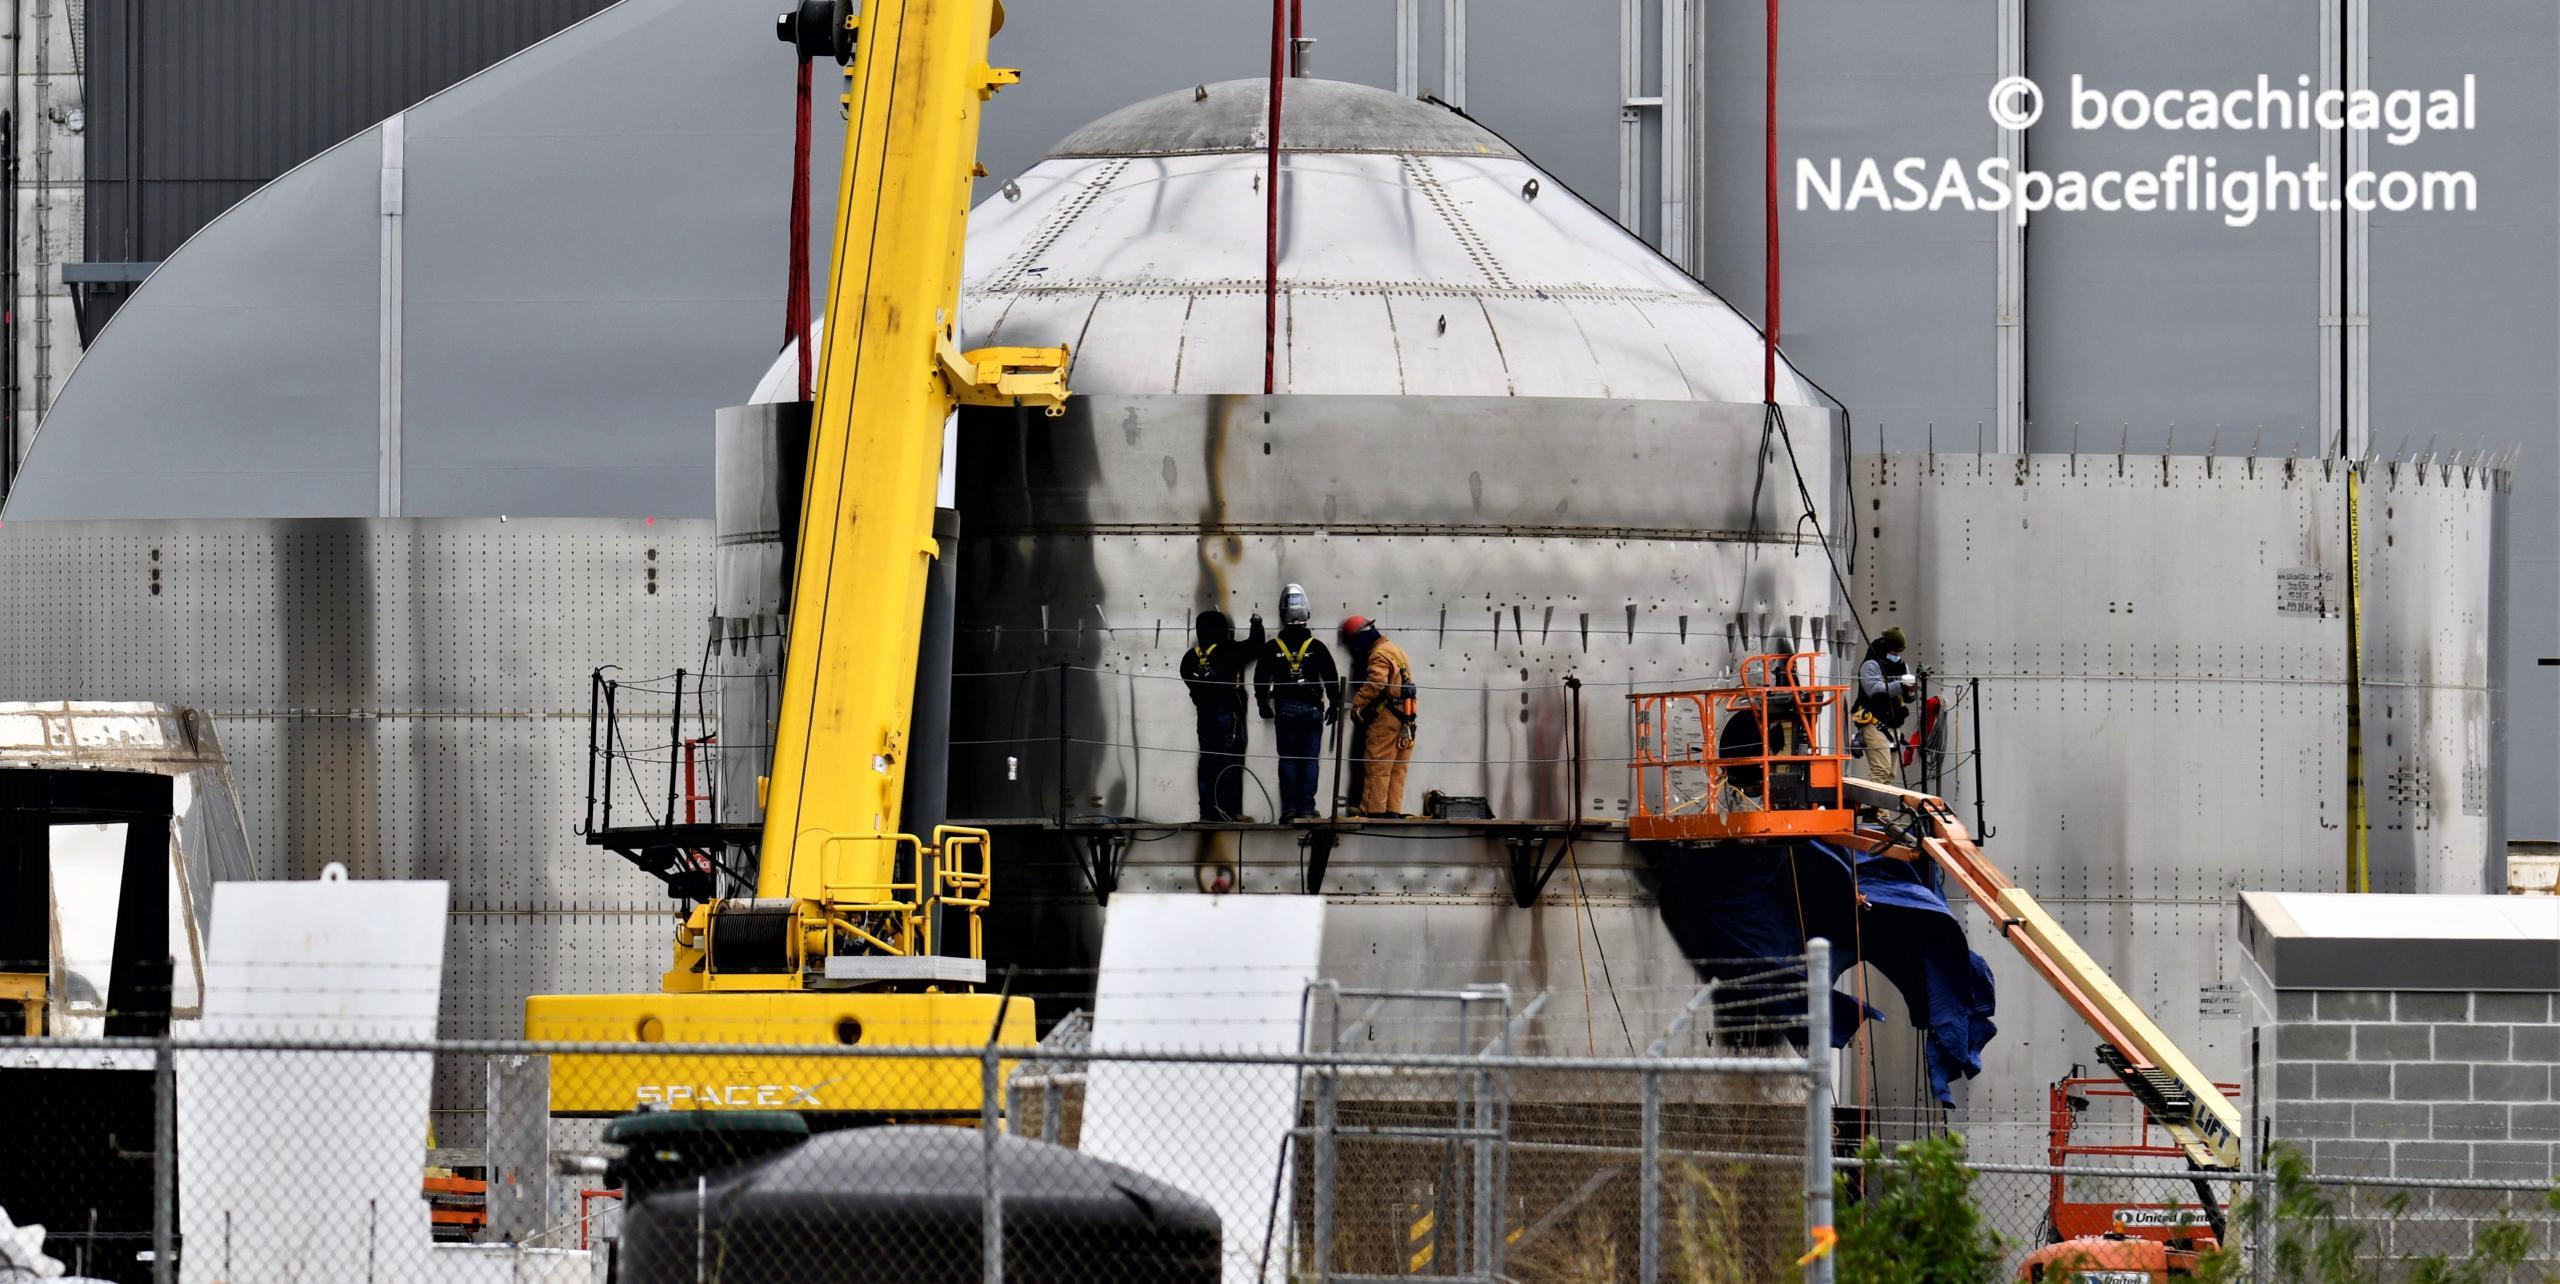 Starship Boca Chica 011221 (NASASpaceflight – bocachicagal) test tank SN7.2 integration 5 crop (c)